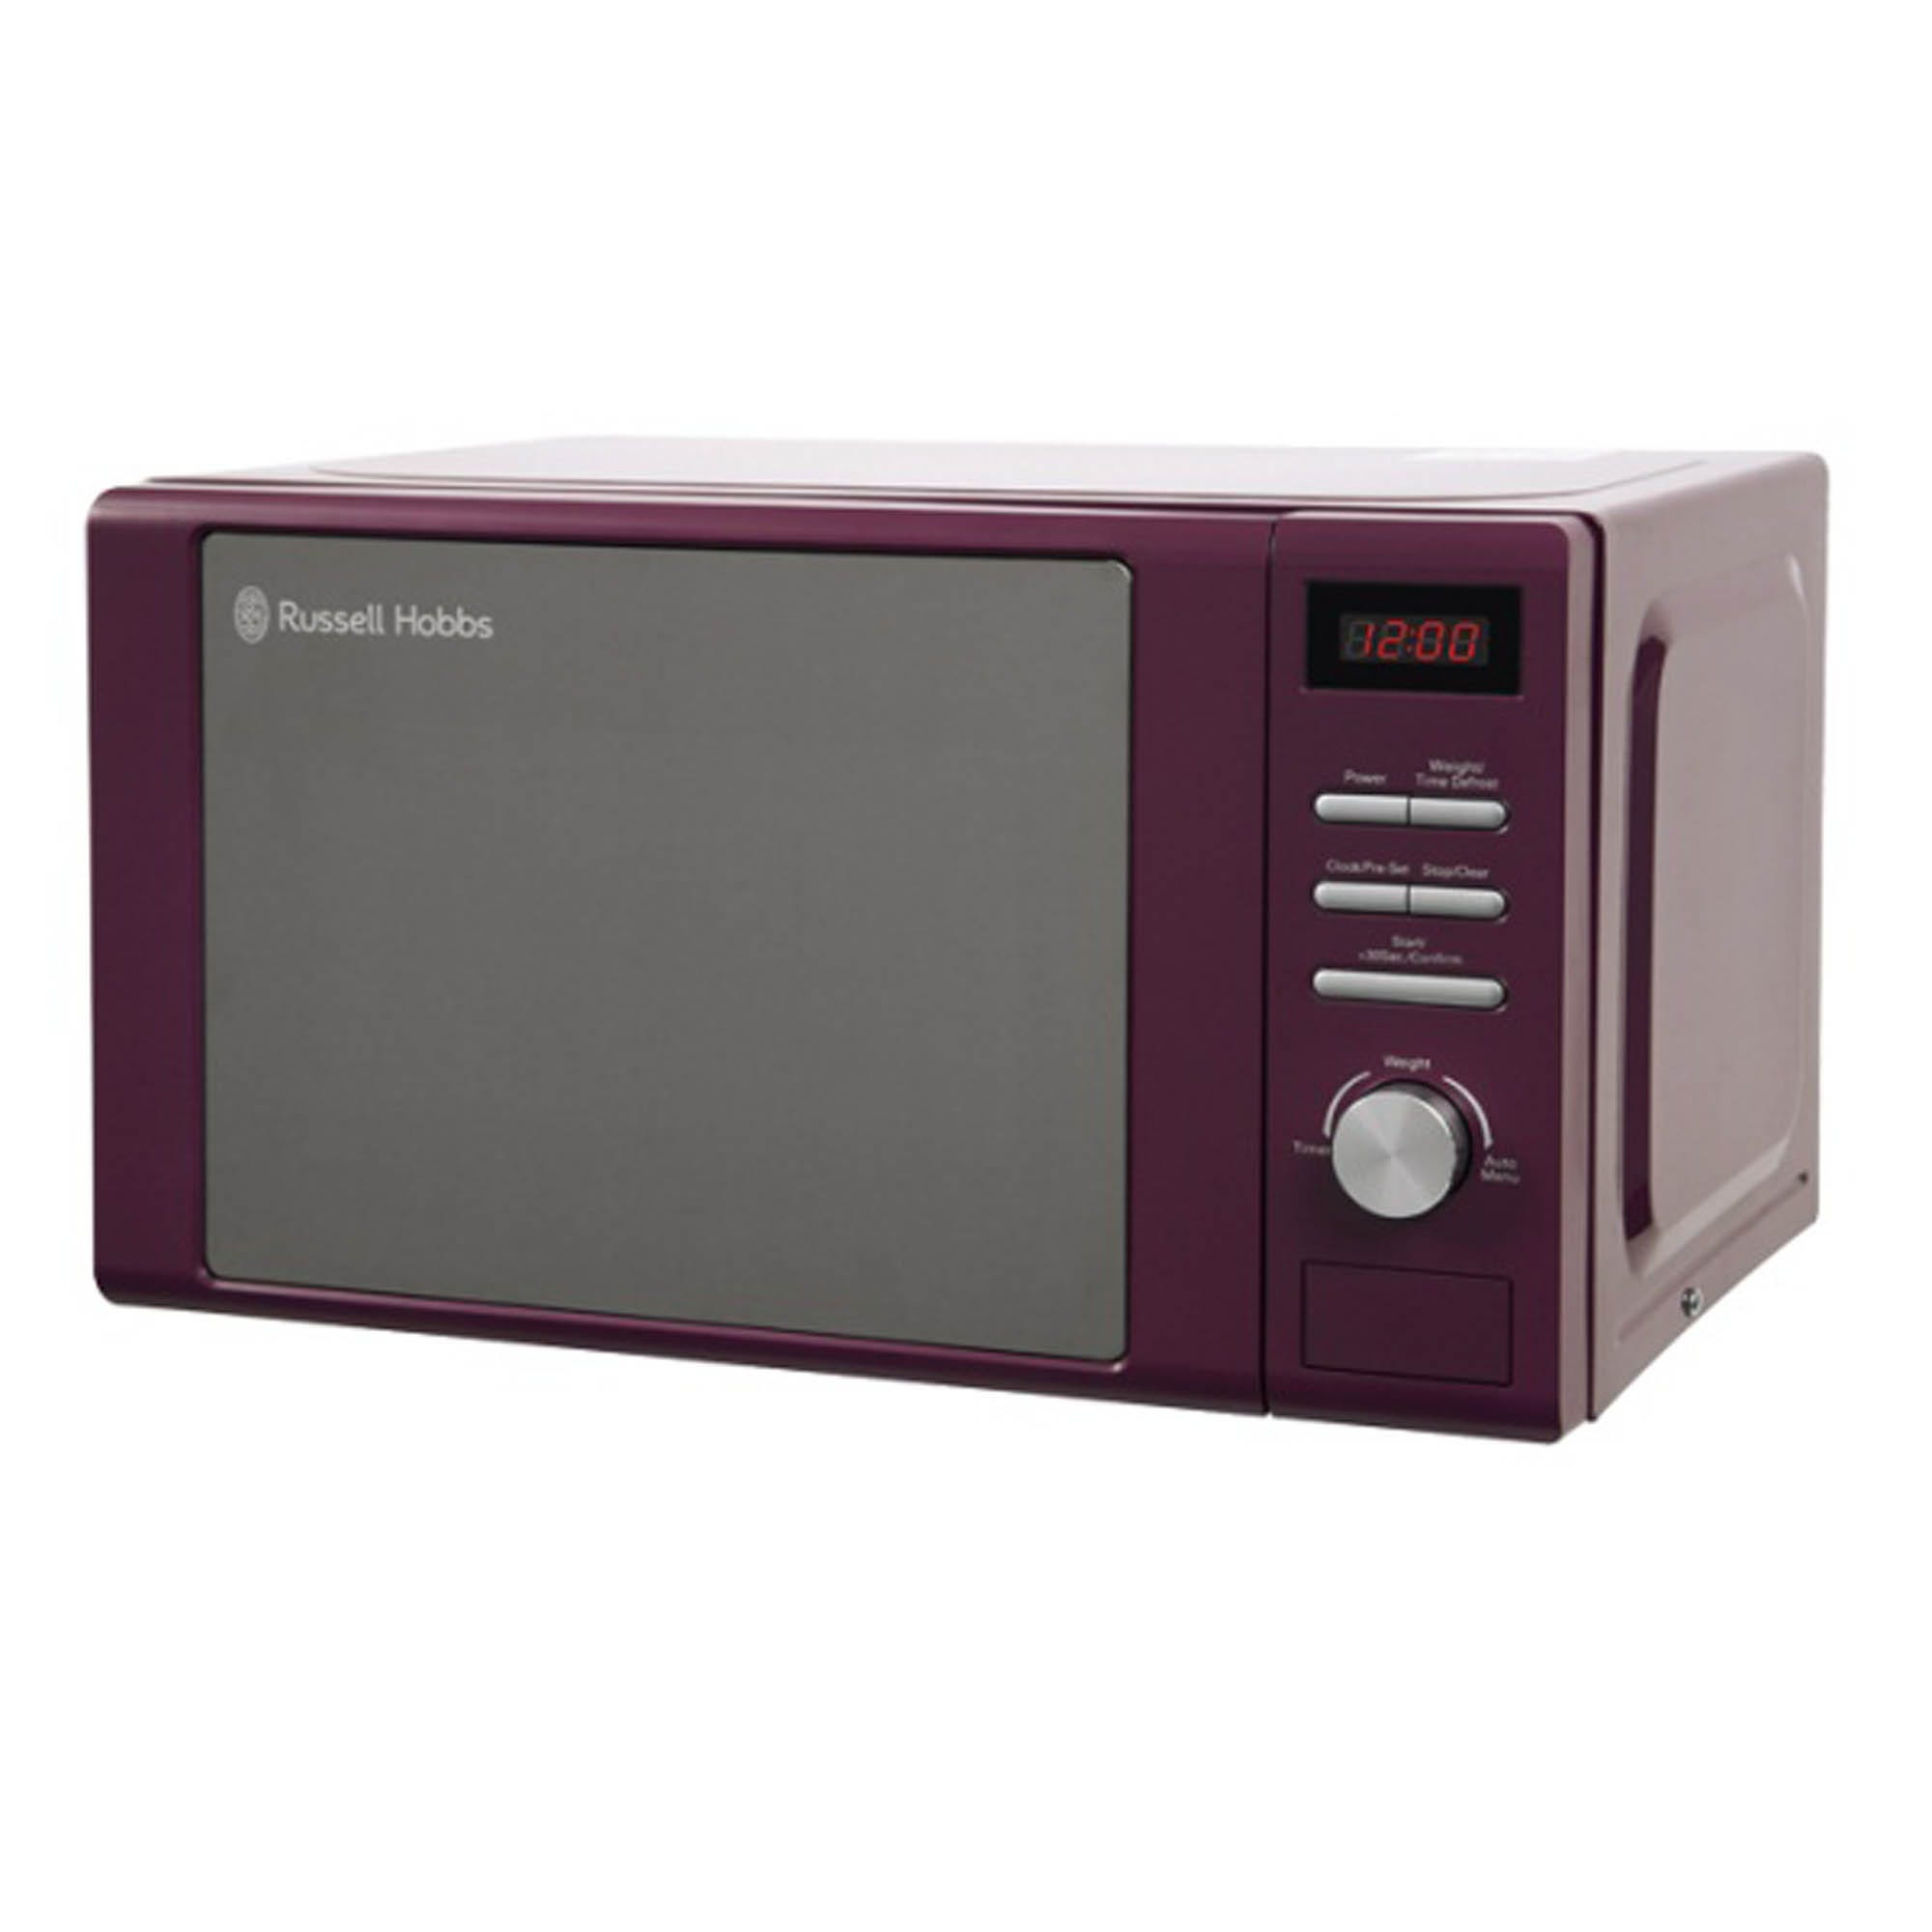 Russell Hobbs 20 Litre Digital Microwave Purple - RHM2064P